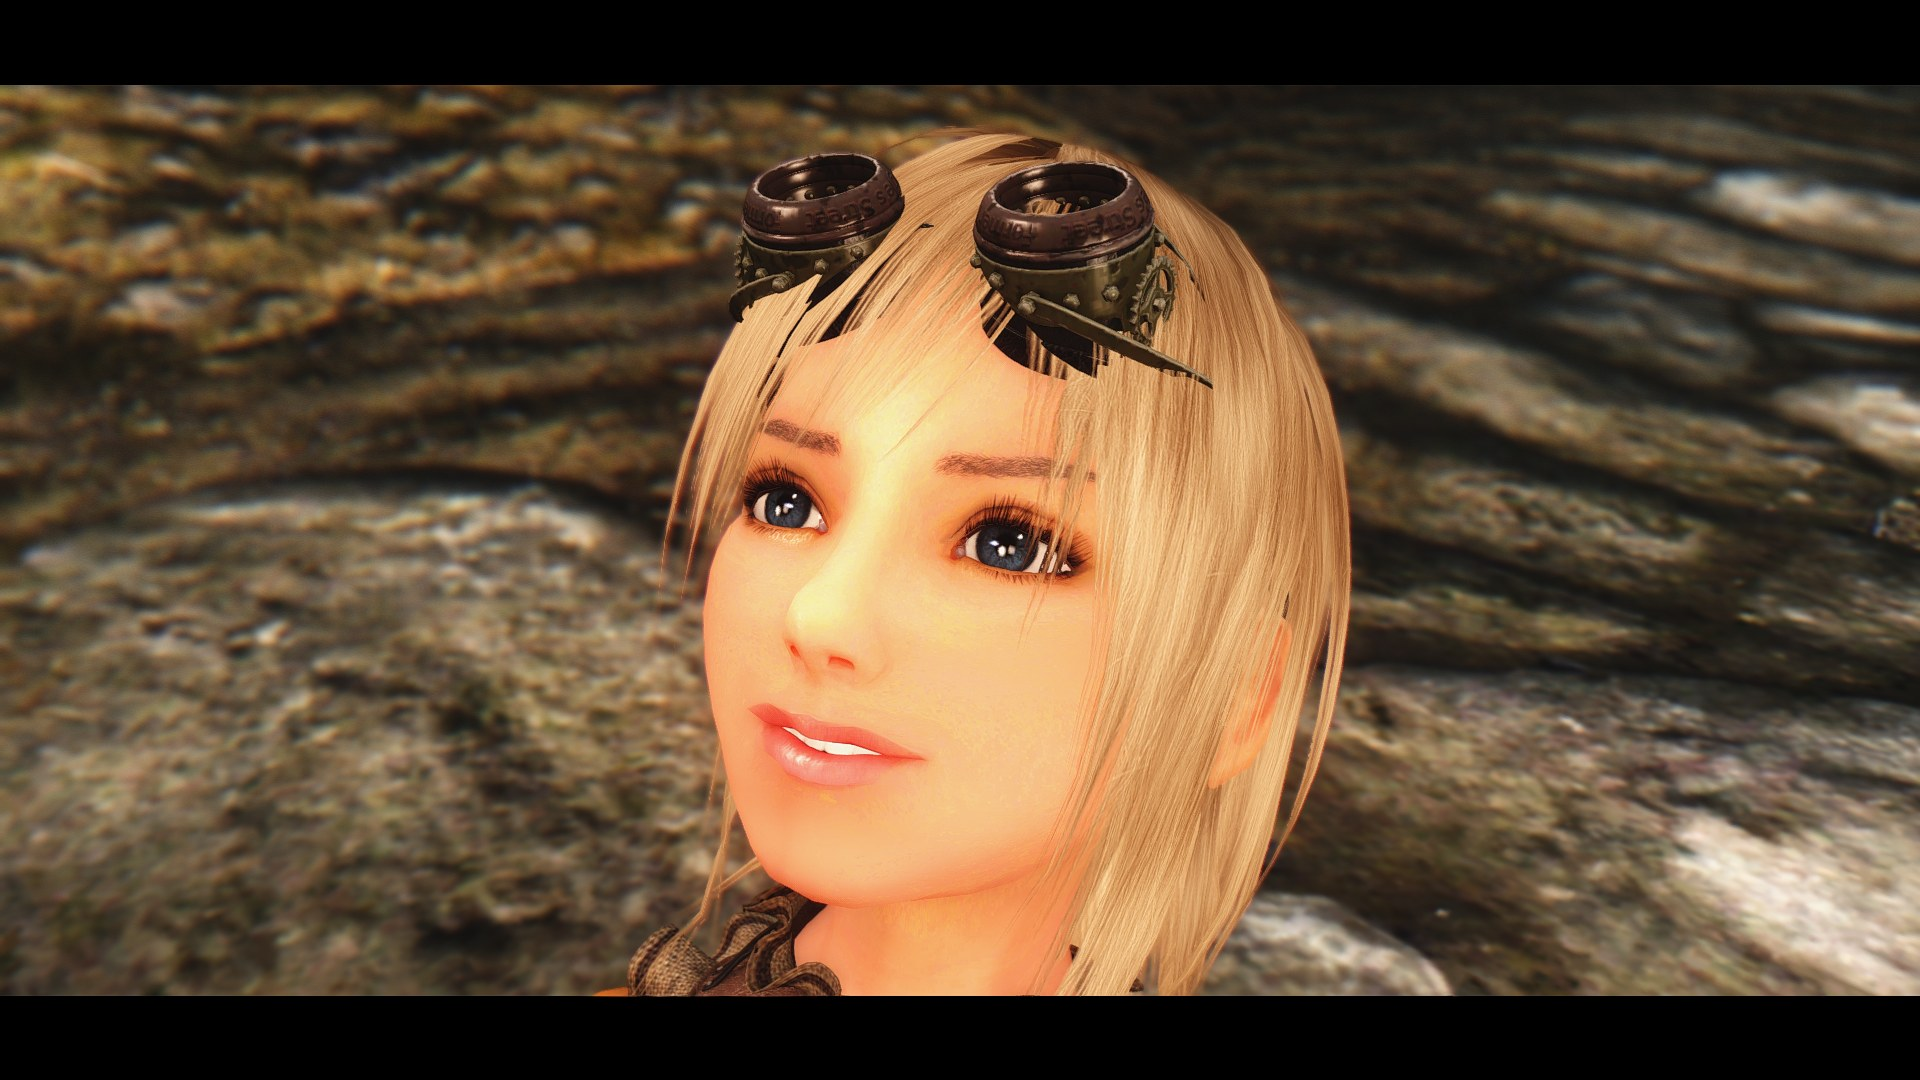 The Elder Scrolls 5: Skyrim - Poet follower Mod by BaronDeConde on